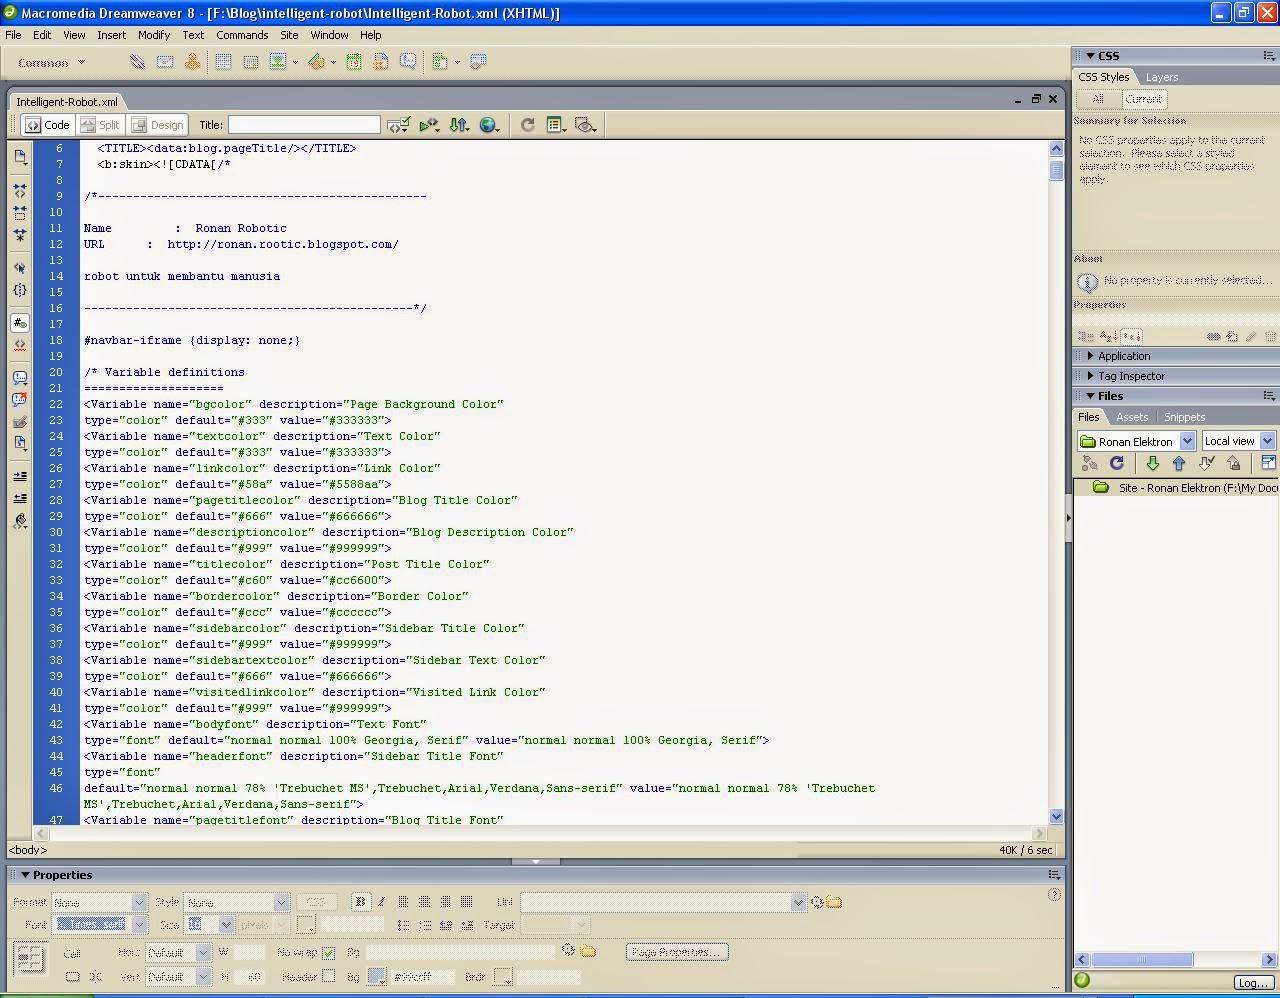 Adobe acrobat 8.0 professional tutorial